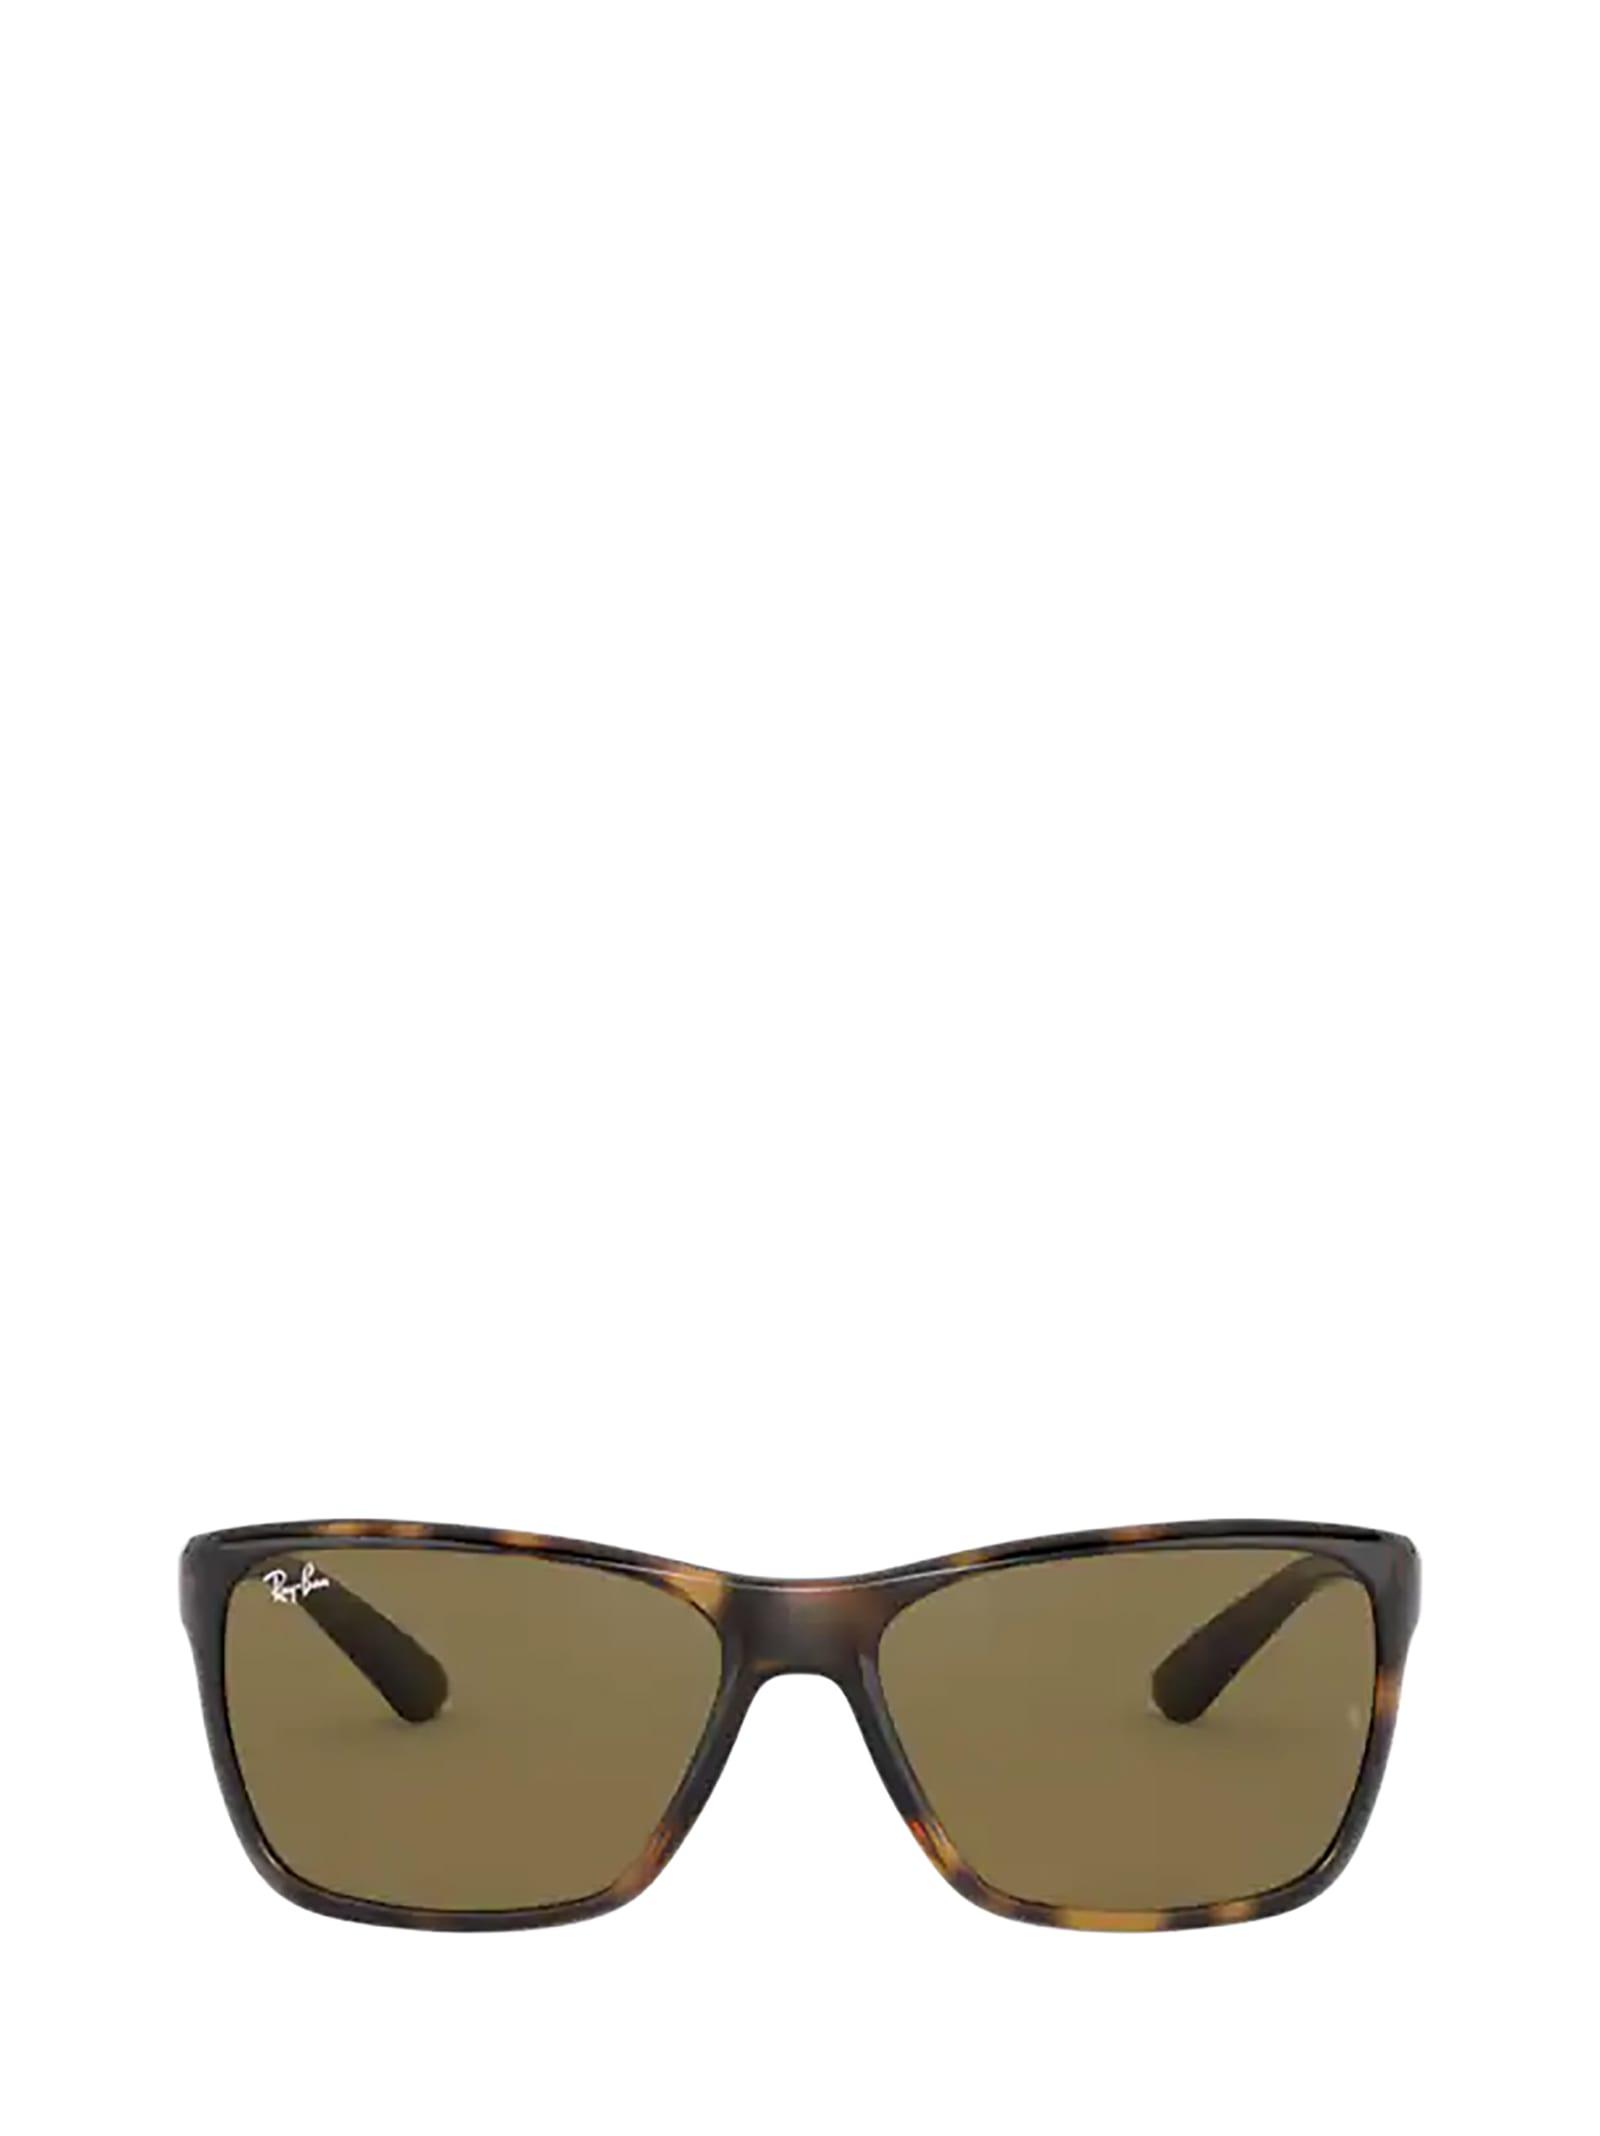 Ray-Ban Ray-ban Rb4331 Light Havana Sunglasses